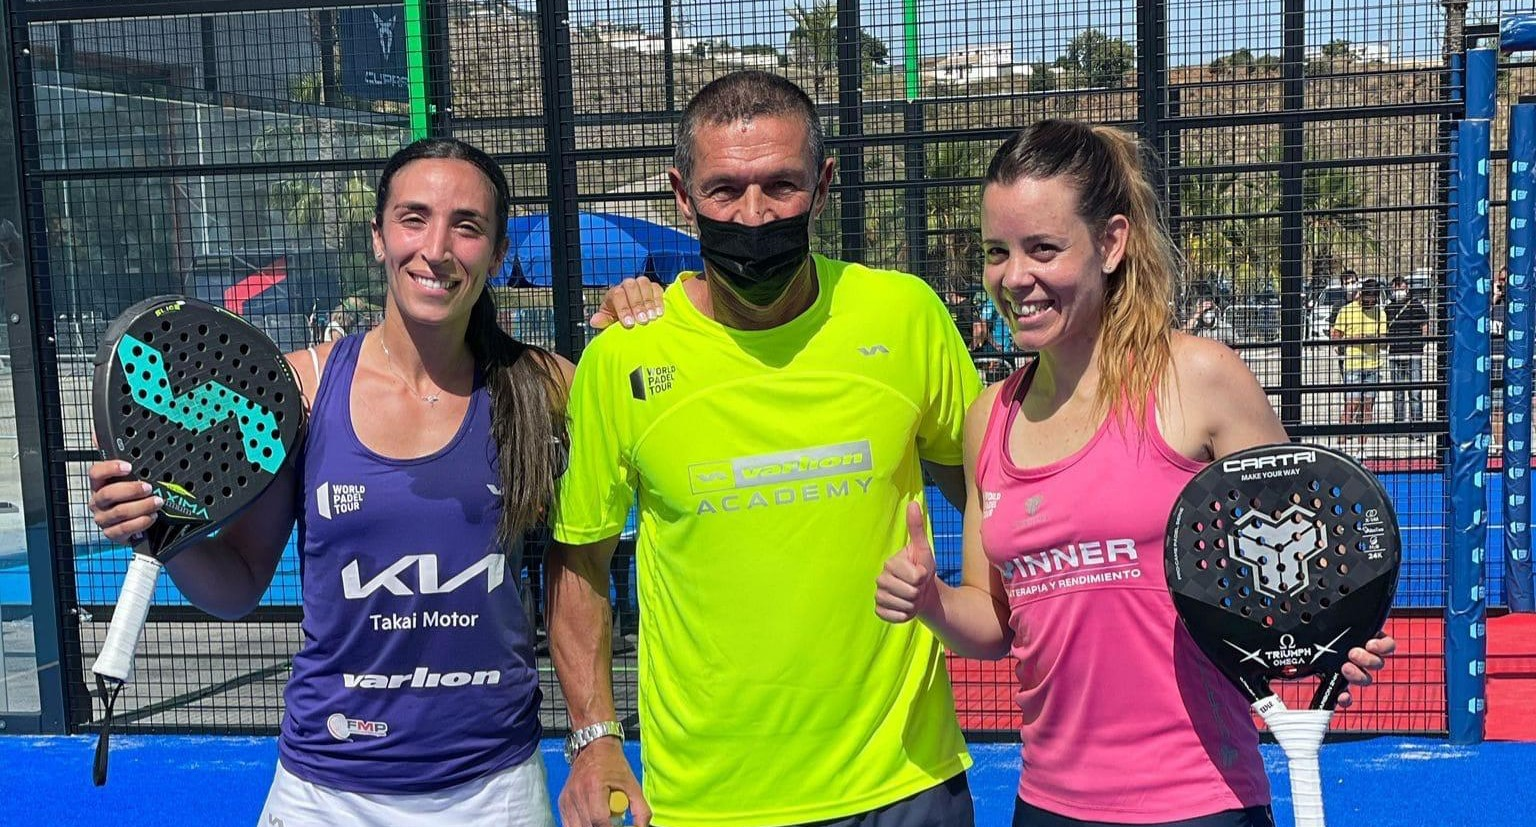 Virseda Martinez coach victoire Marbella Master